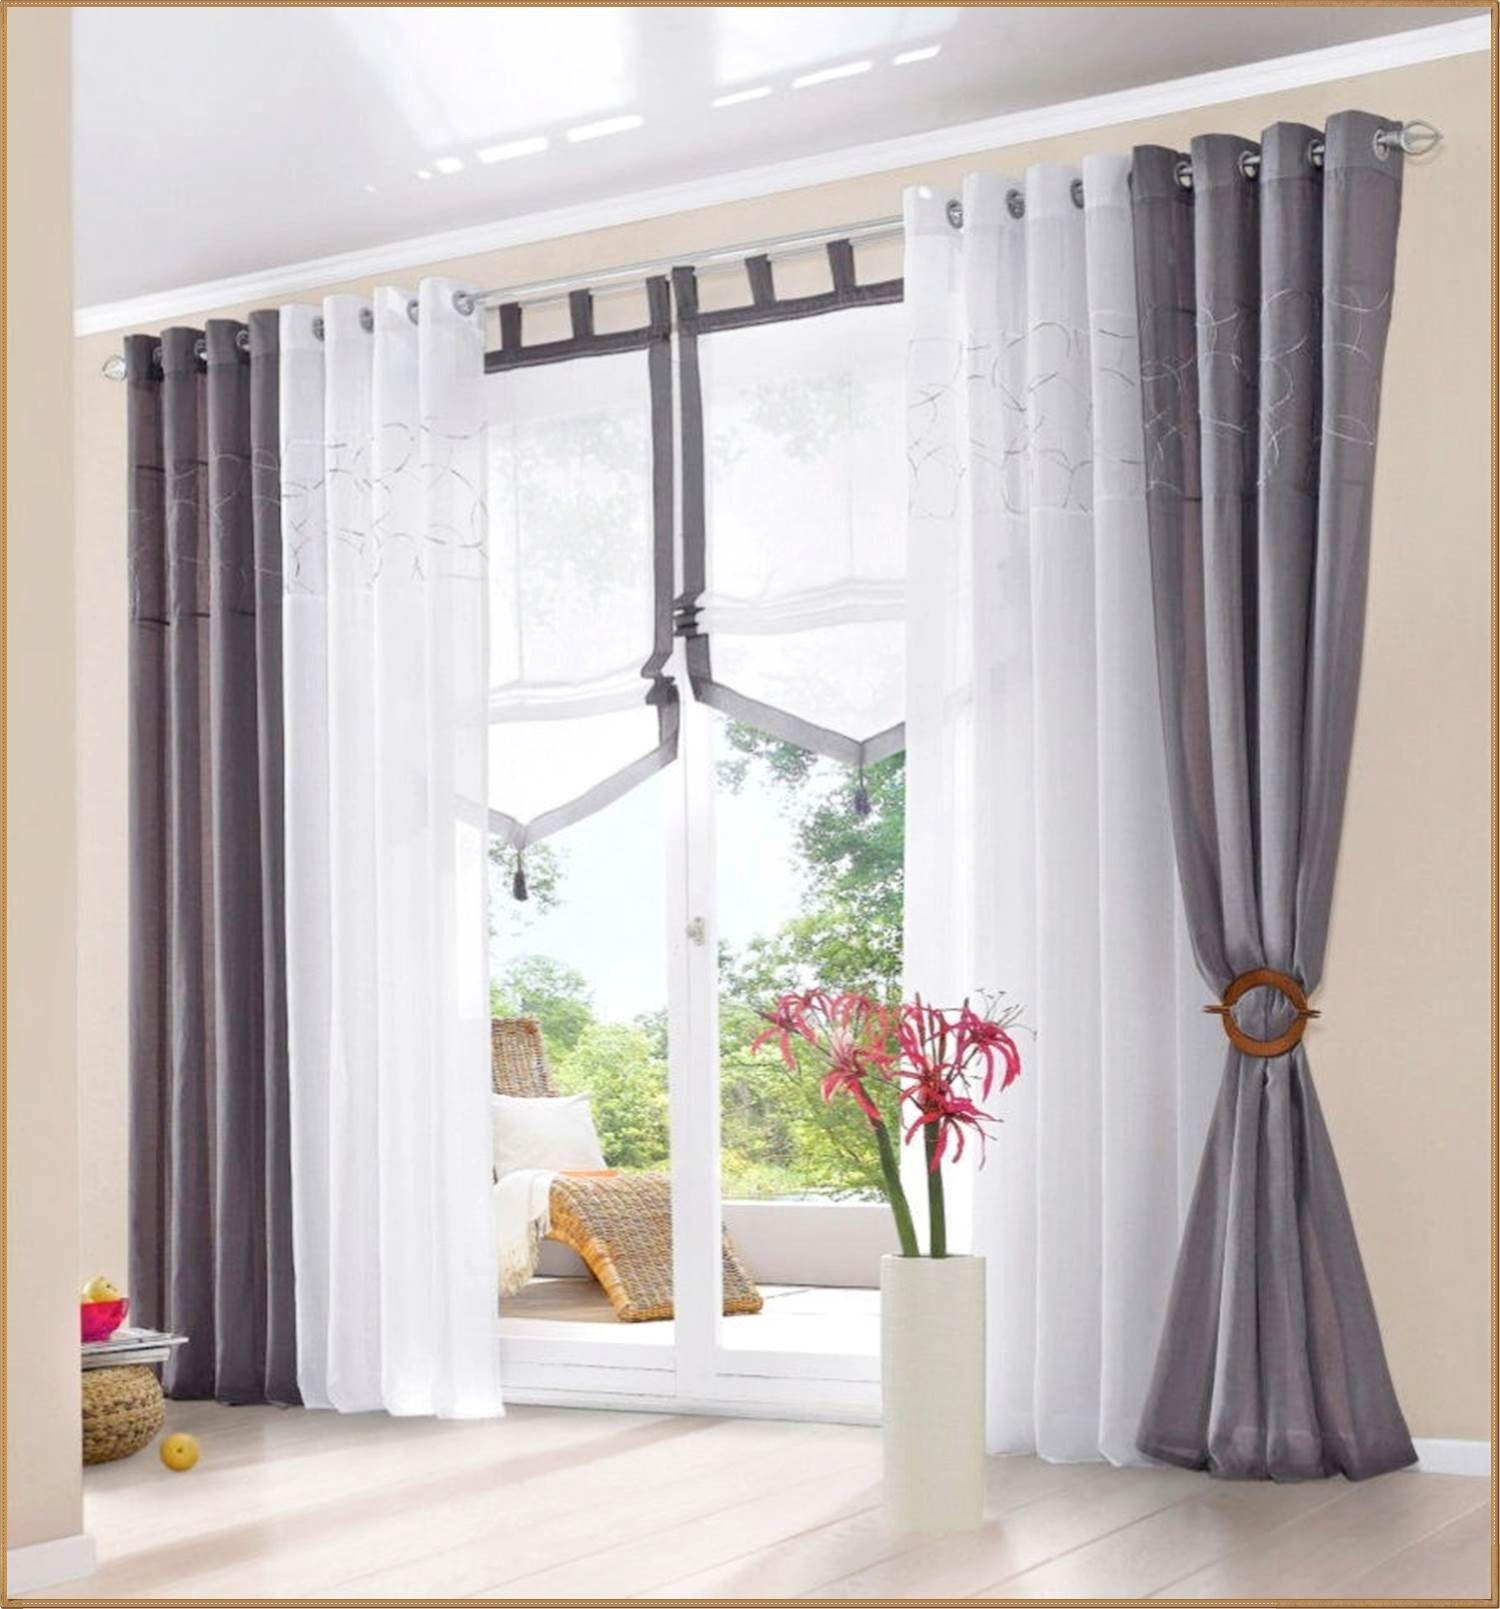 cortinas para sala modernas - Búsqueda de Google | Cindy | Pinterest ...